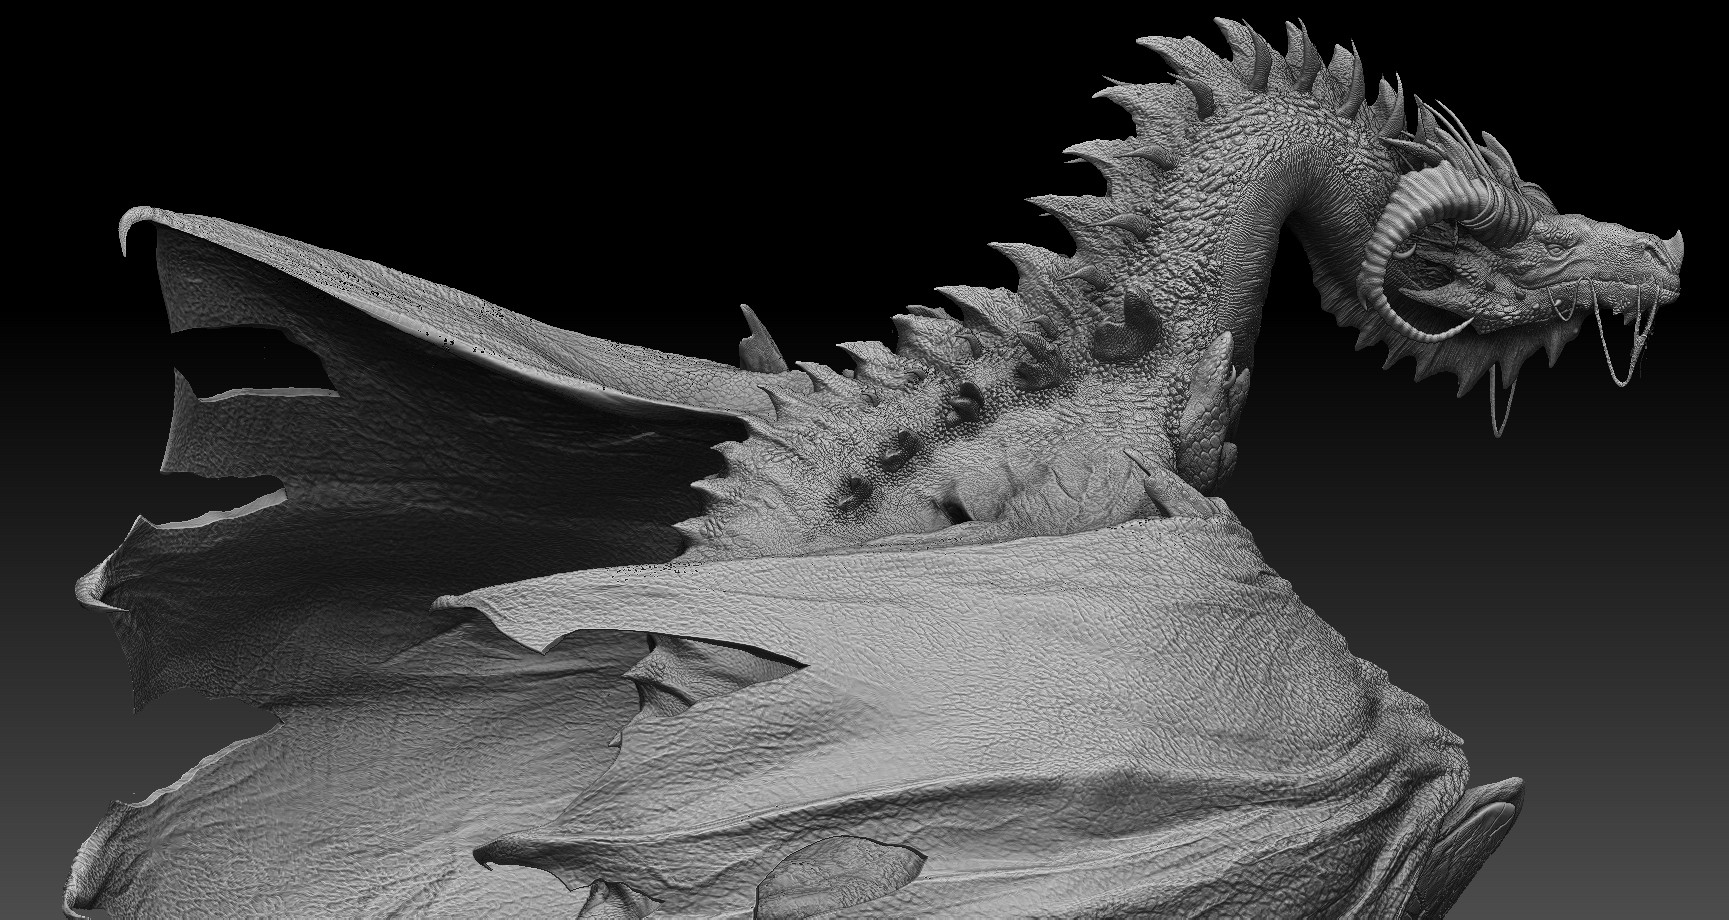 Pablo olivera dragon render lateral v01